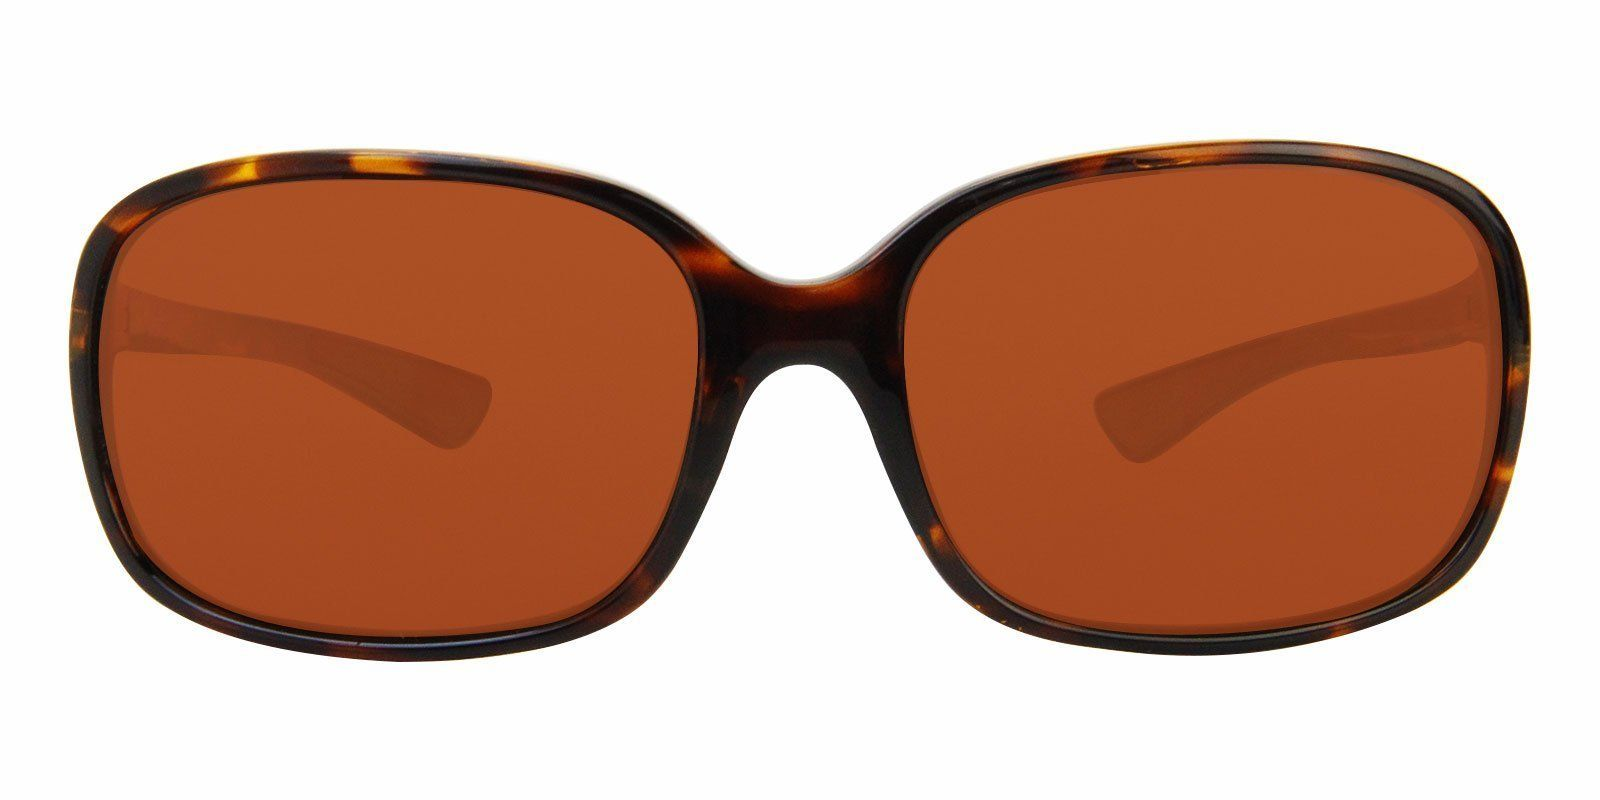 7304c0b41eea Costa Del Mar - Riverton Tortoise - Brown sunglasses in 2018